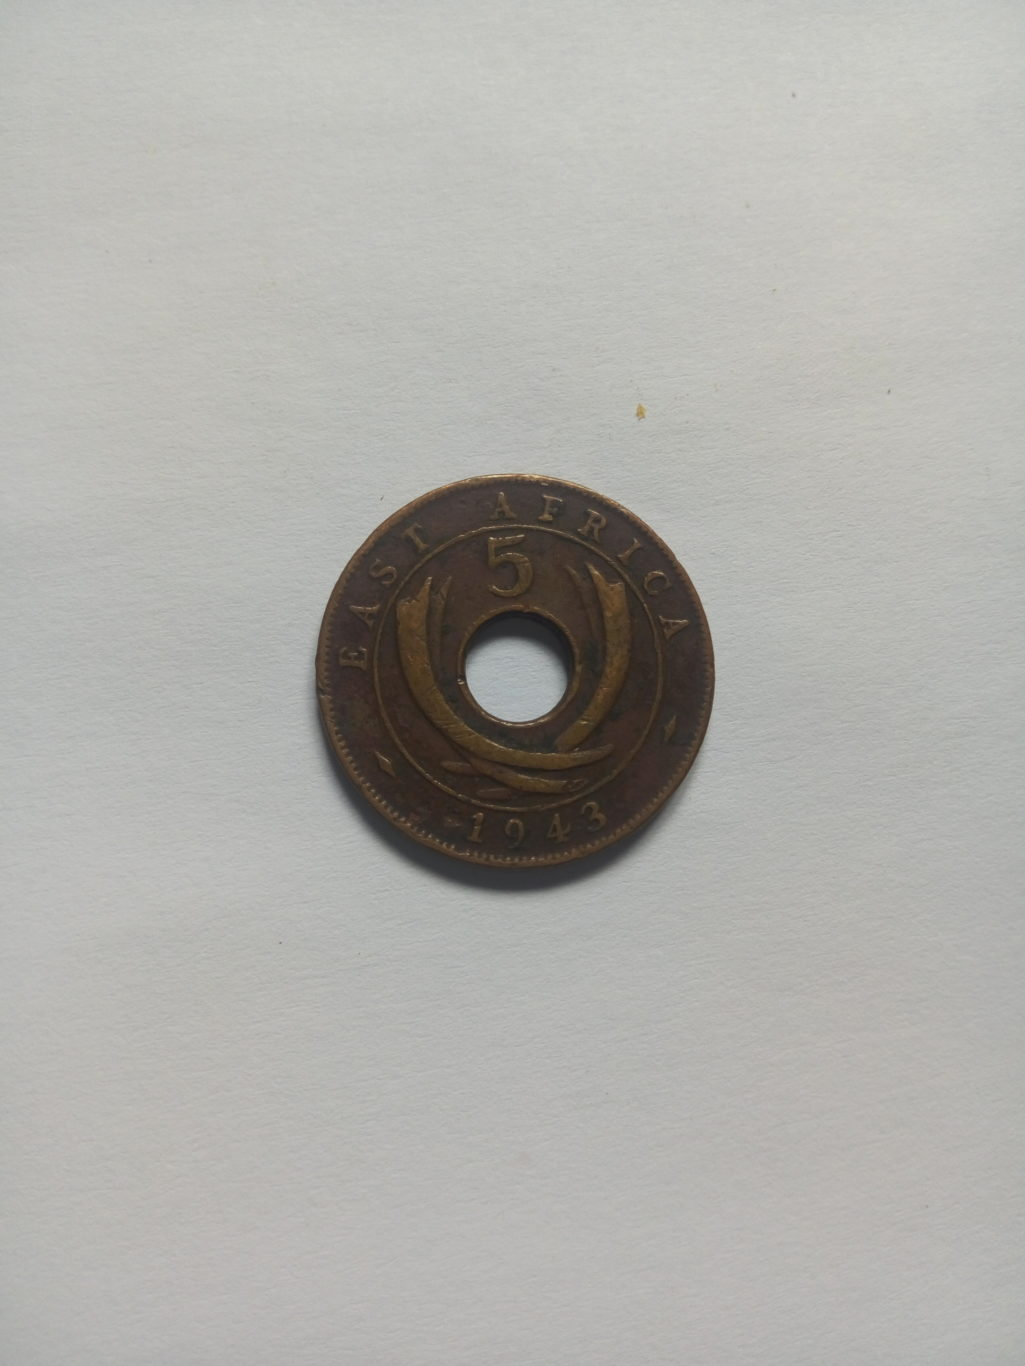 1943_georgivs V1 Rex 5 cents